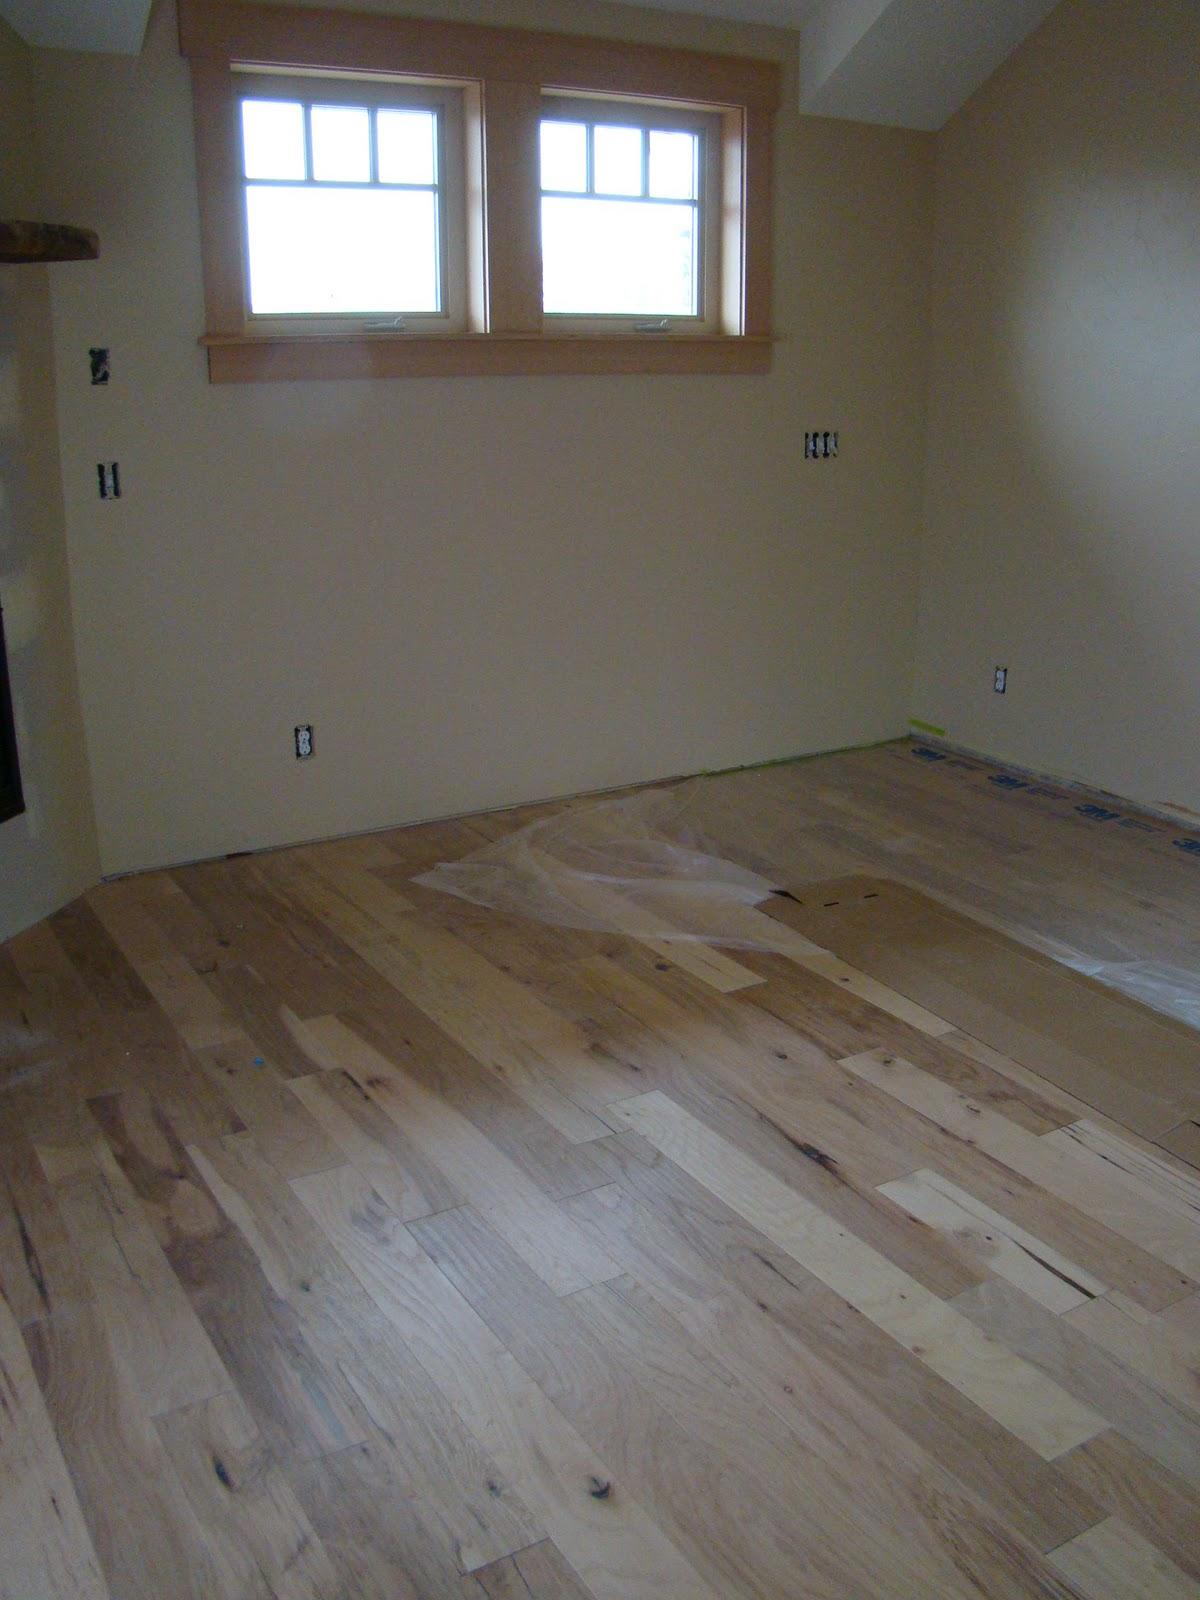 ... hardwood flooring menards 2017 - Hardwood and Carpet Flooring